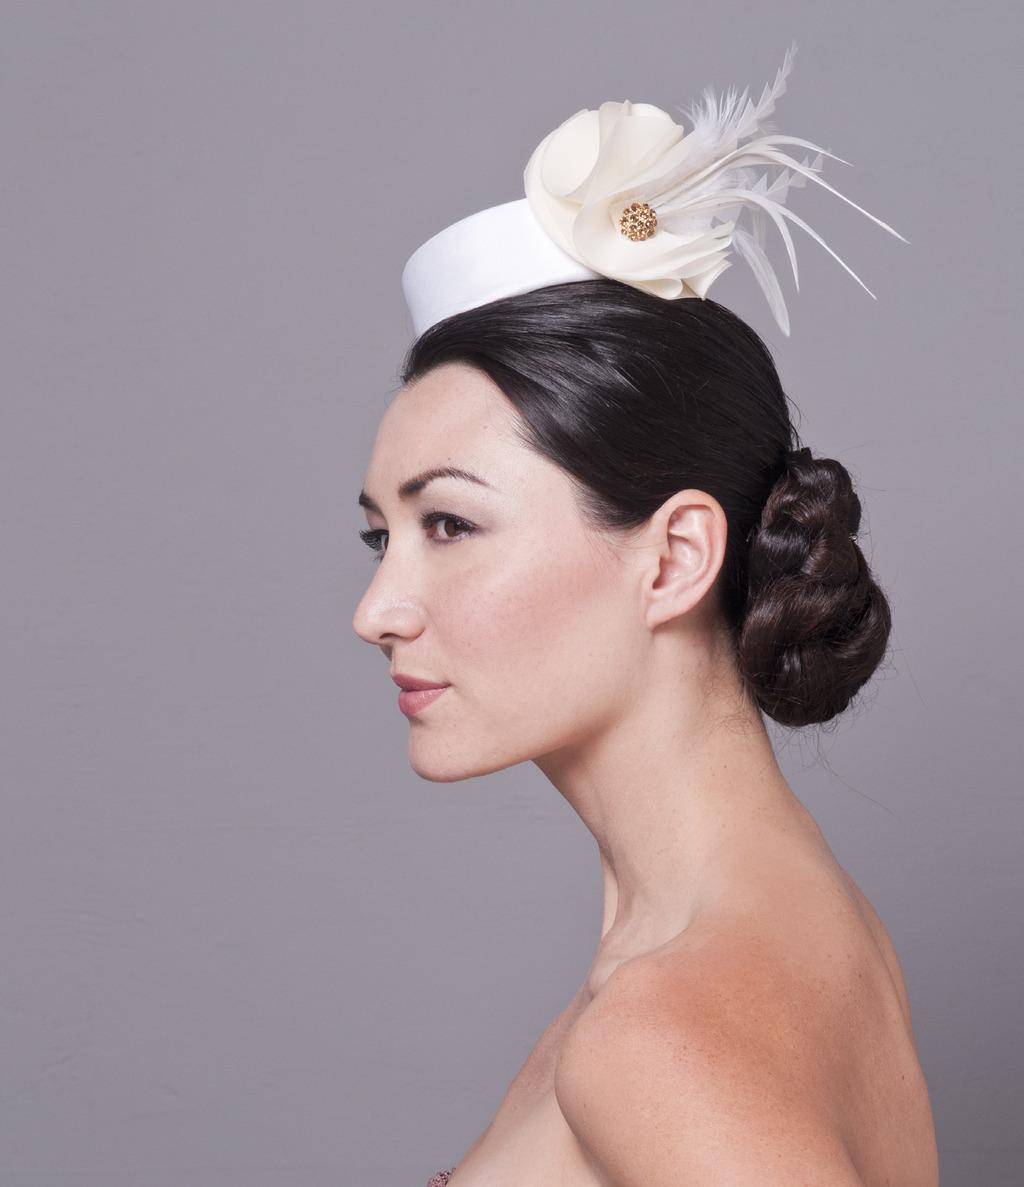 Bijou_bridal-wedding-hats-pillbox-feathers.full